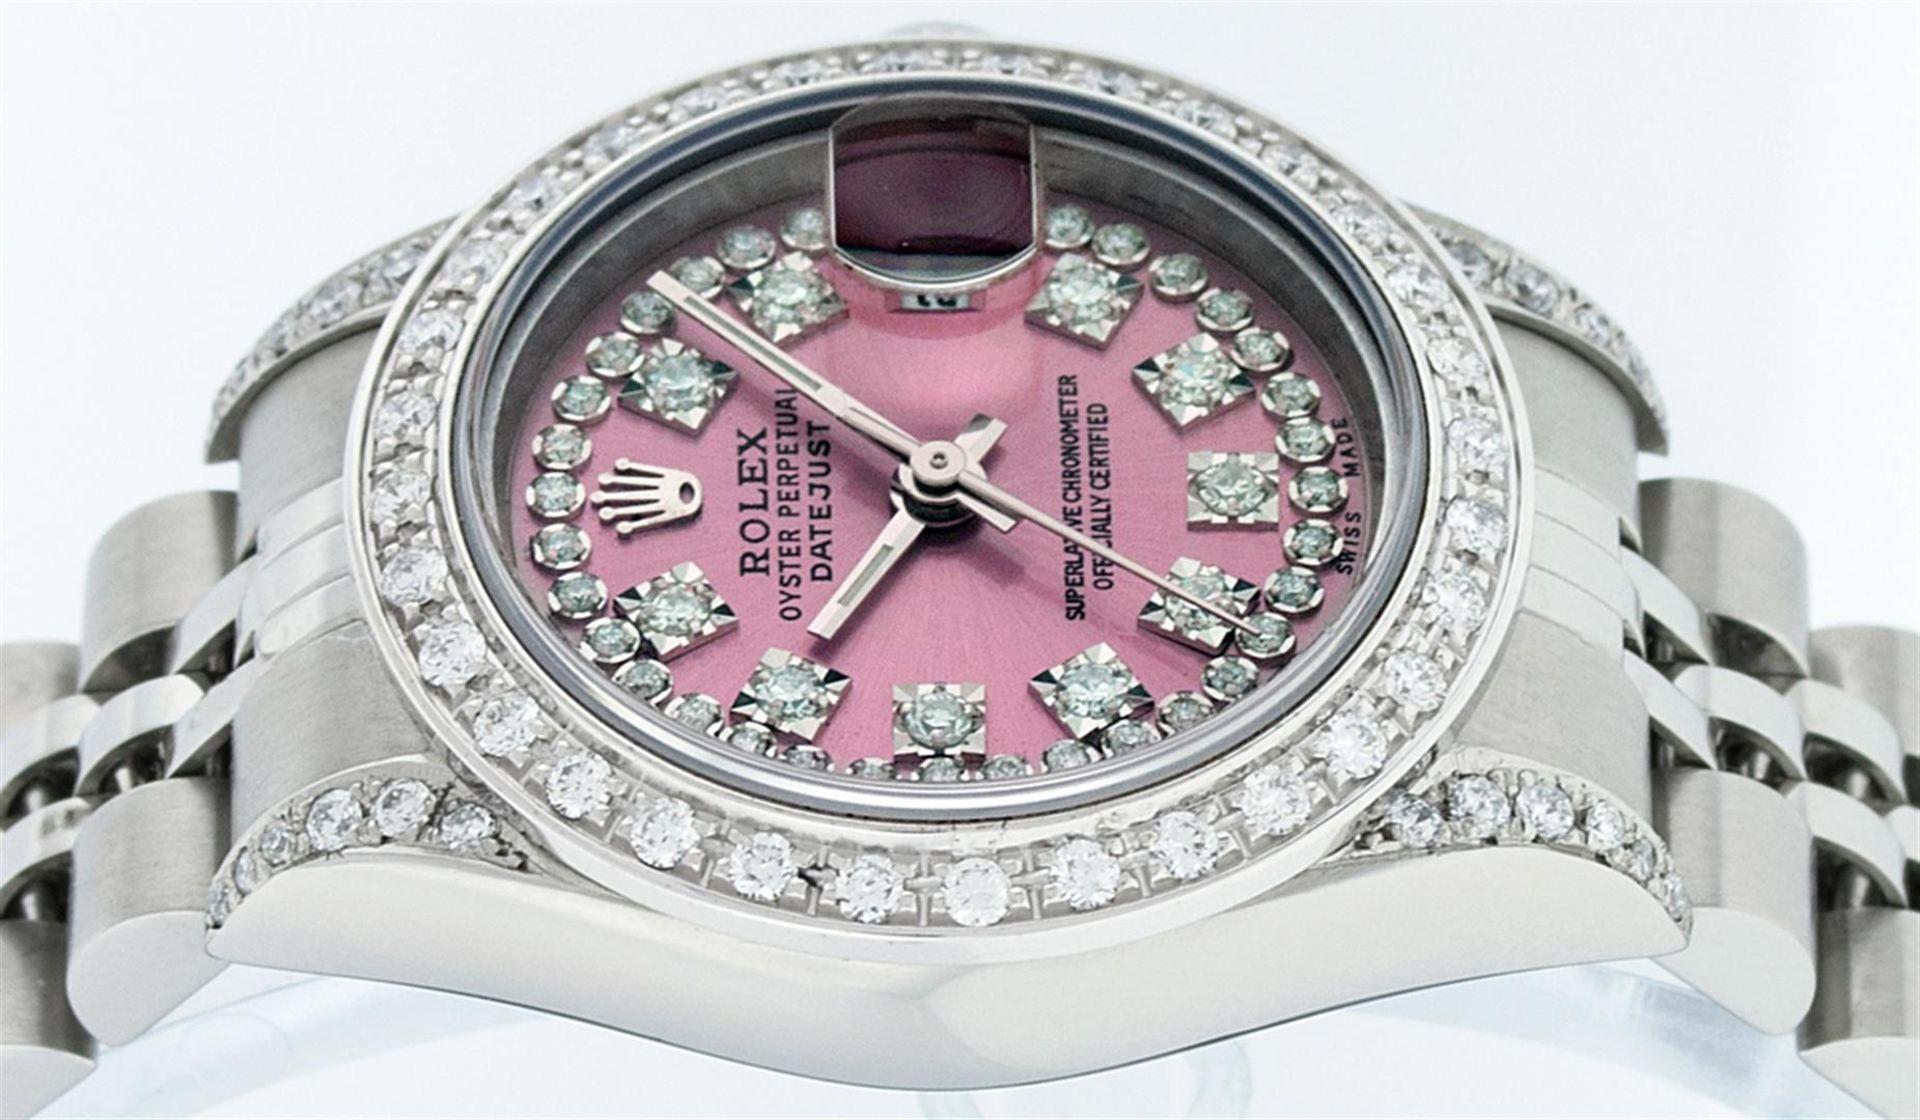 Rolex Ladies Stainless Steel Quickset Pink String Diamond Lugs Datejust Wristwat - Image 3 of 9